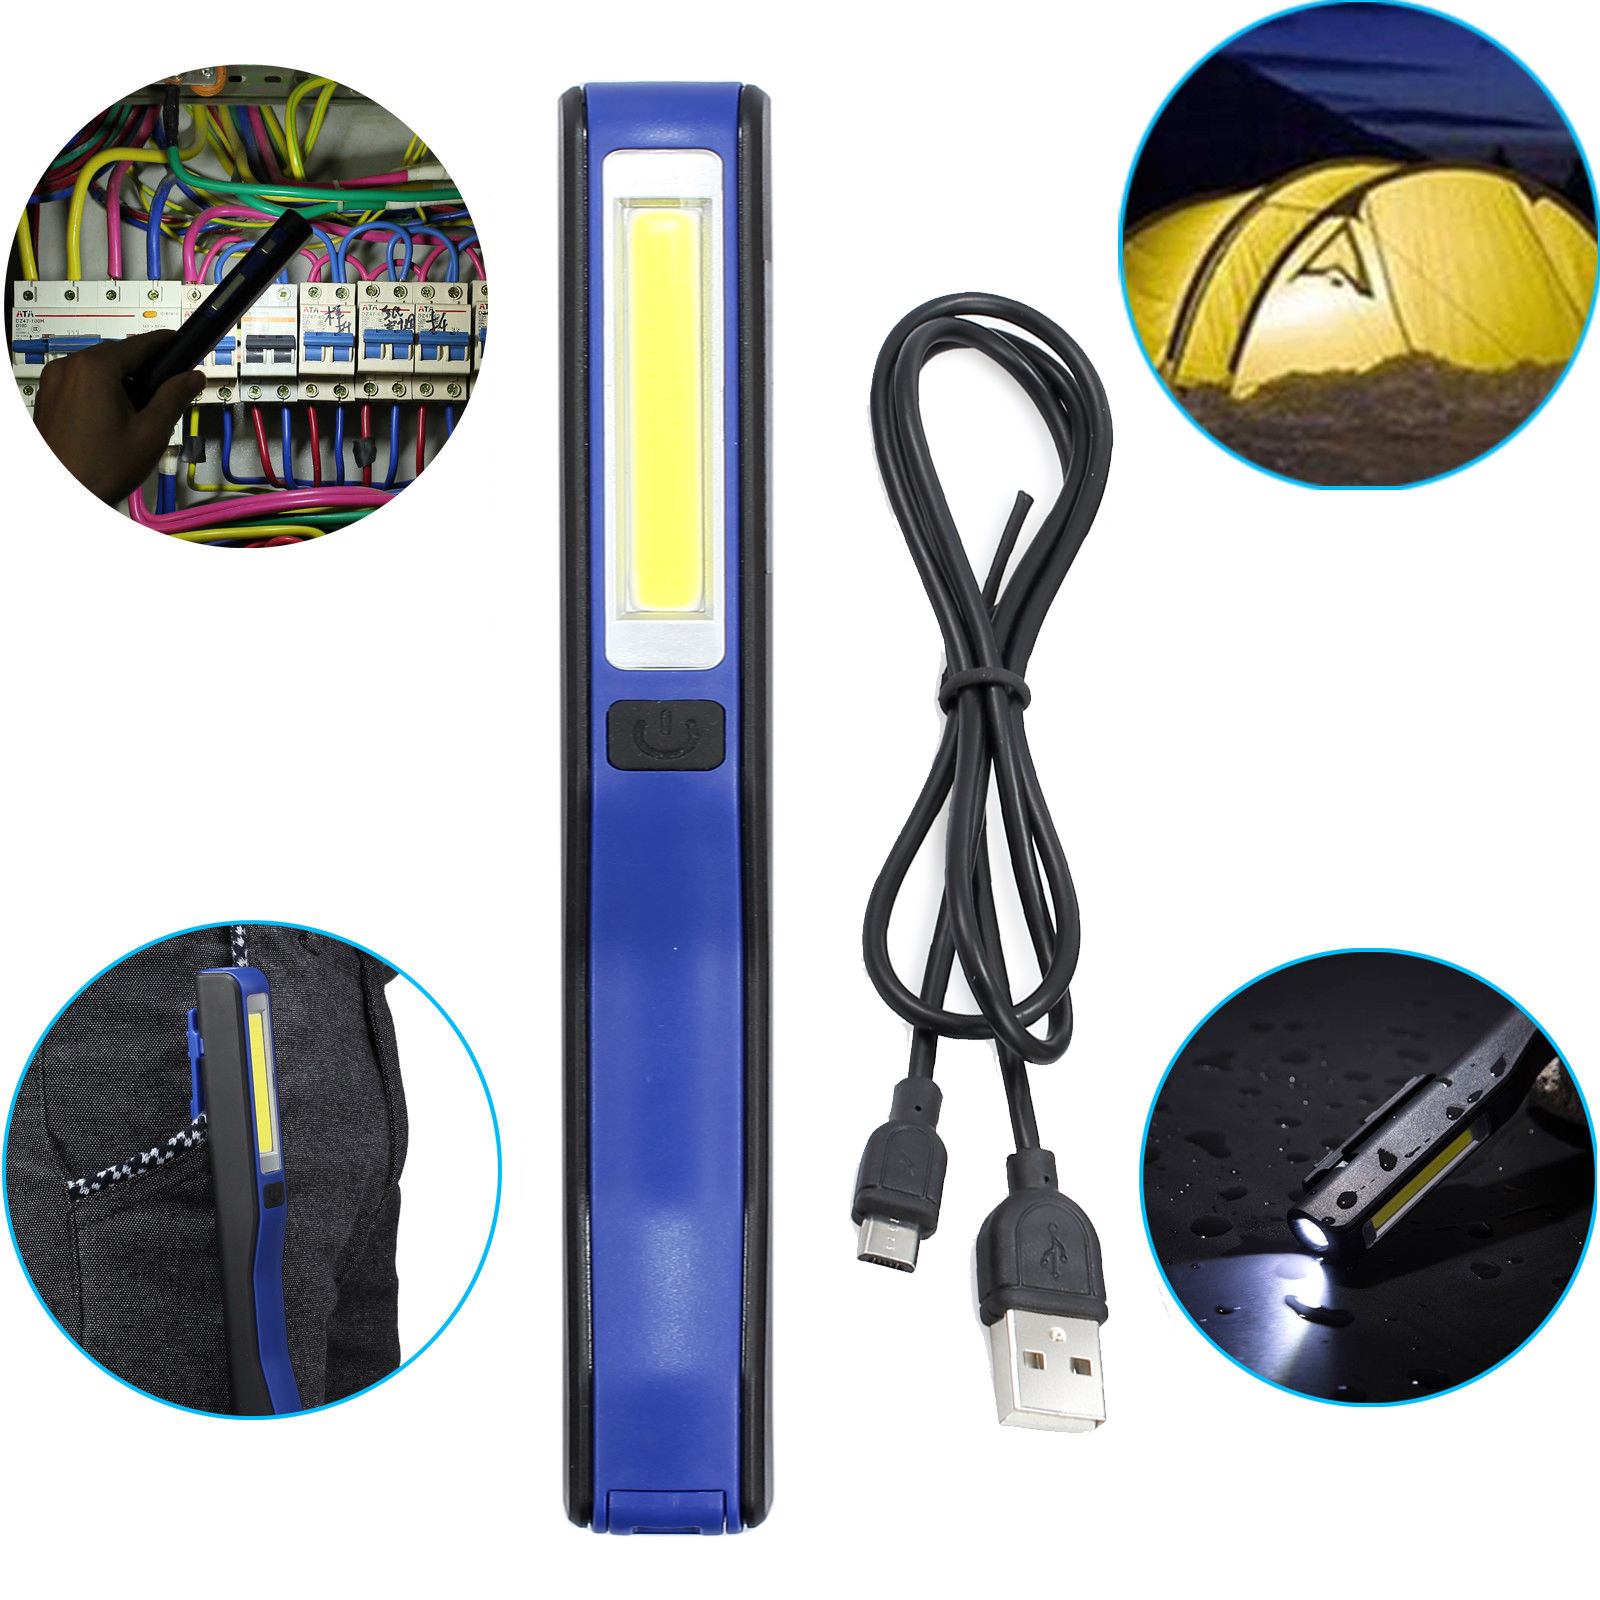 Portable Magnetic Rechargeable COB LED Work Light Flod Flashlight USB Torch Lamp